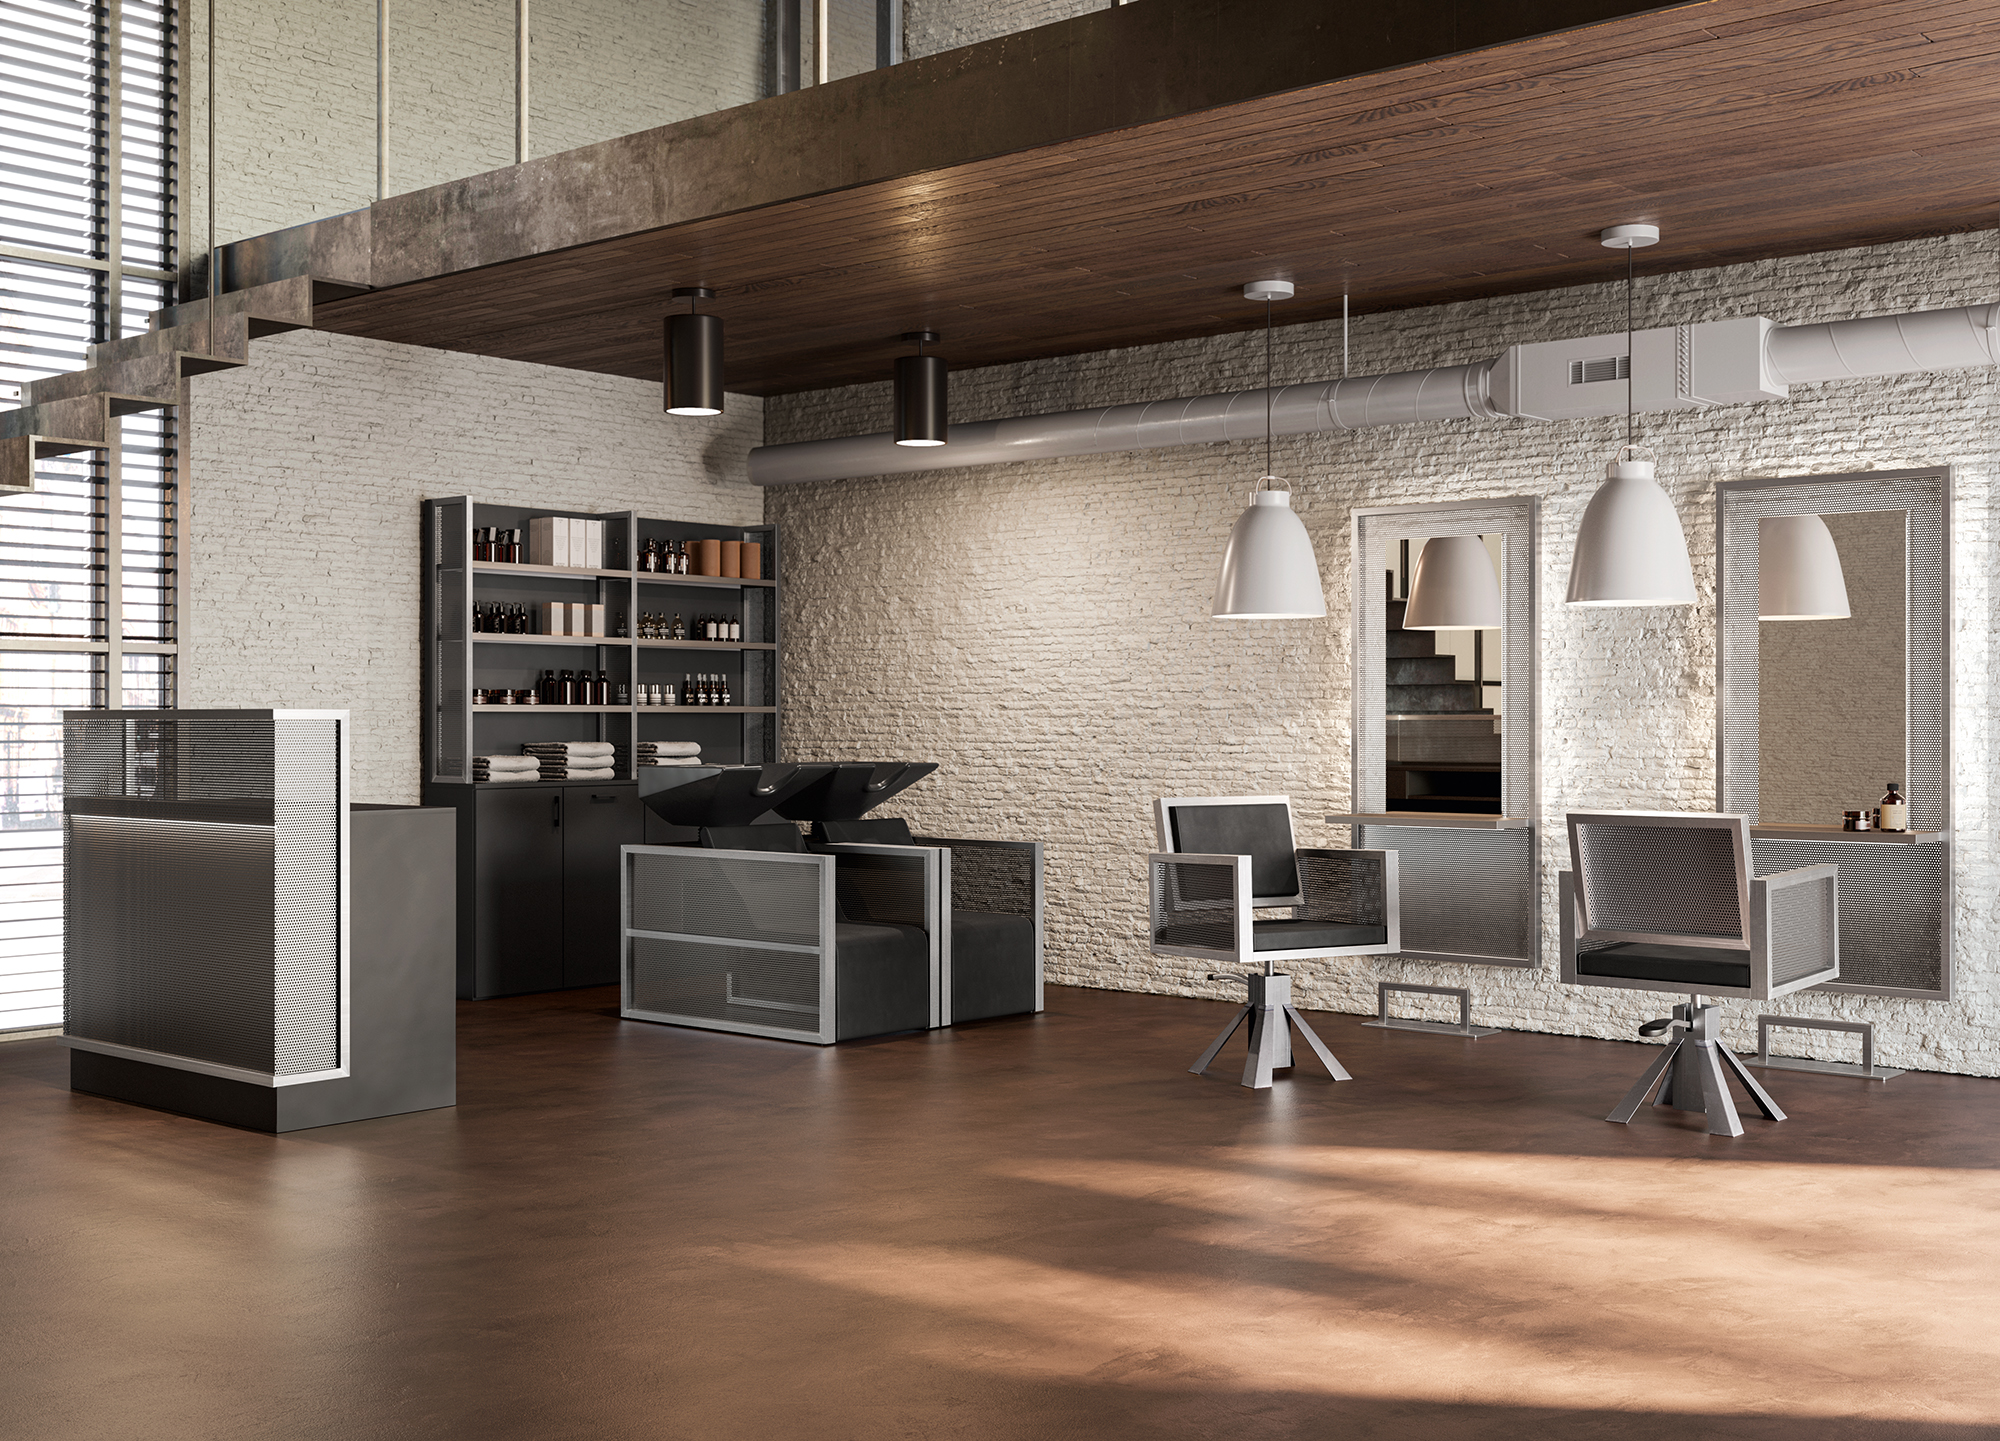 Iron Salon Furnishing Line by Vezzosi